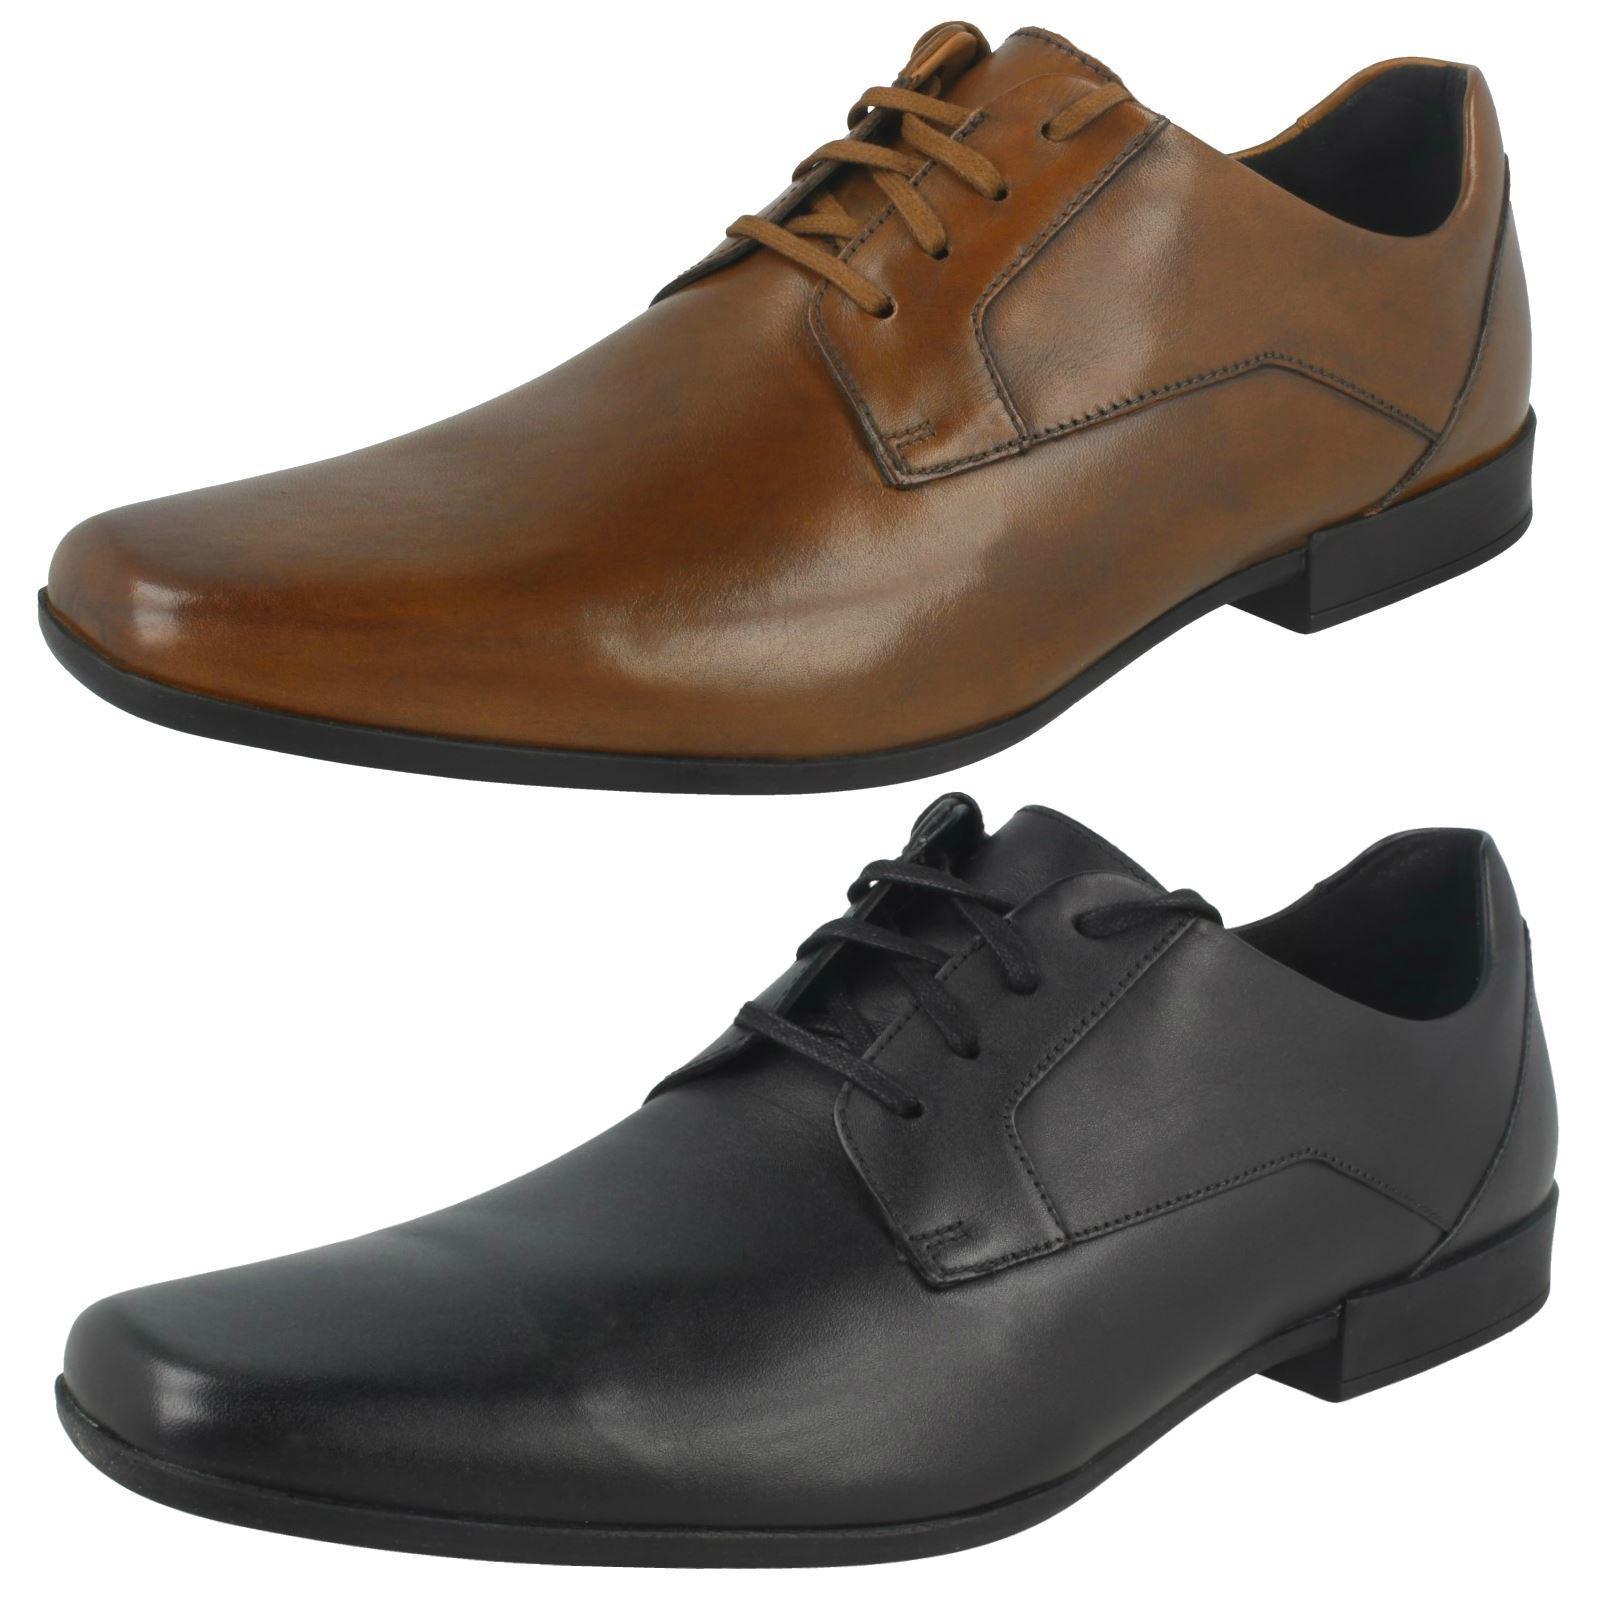 Homme Clarks Formal Chaussures-Règlement dentelle